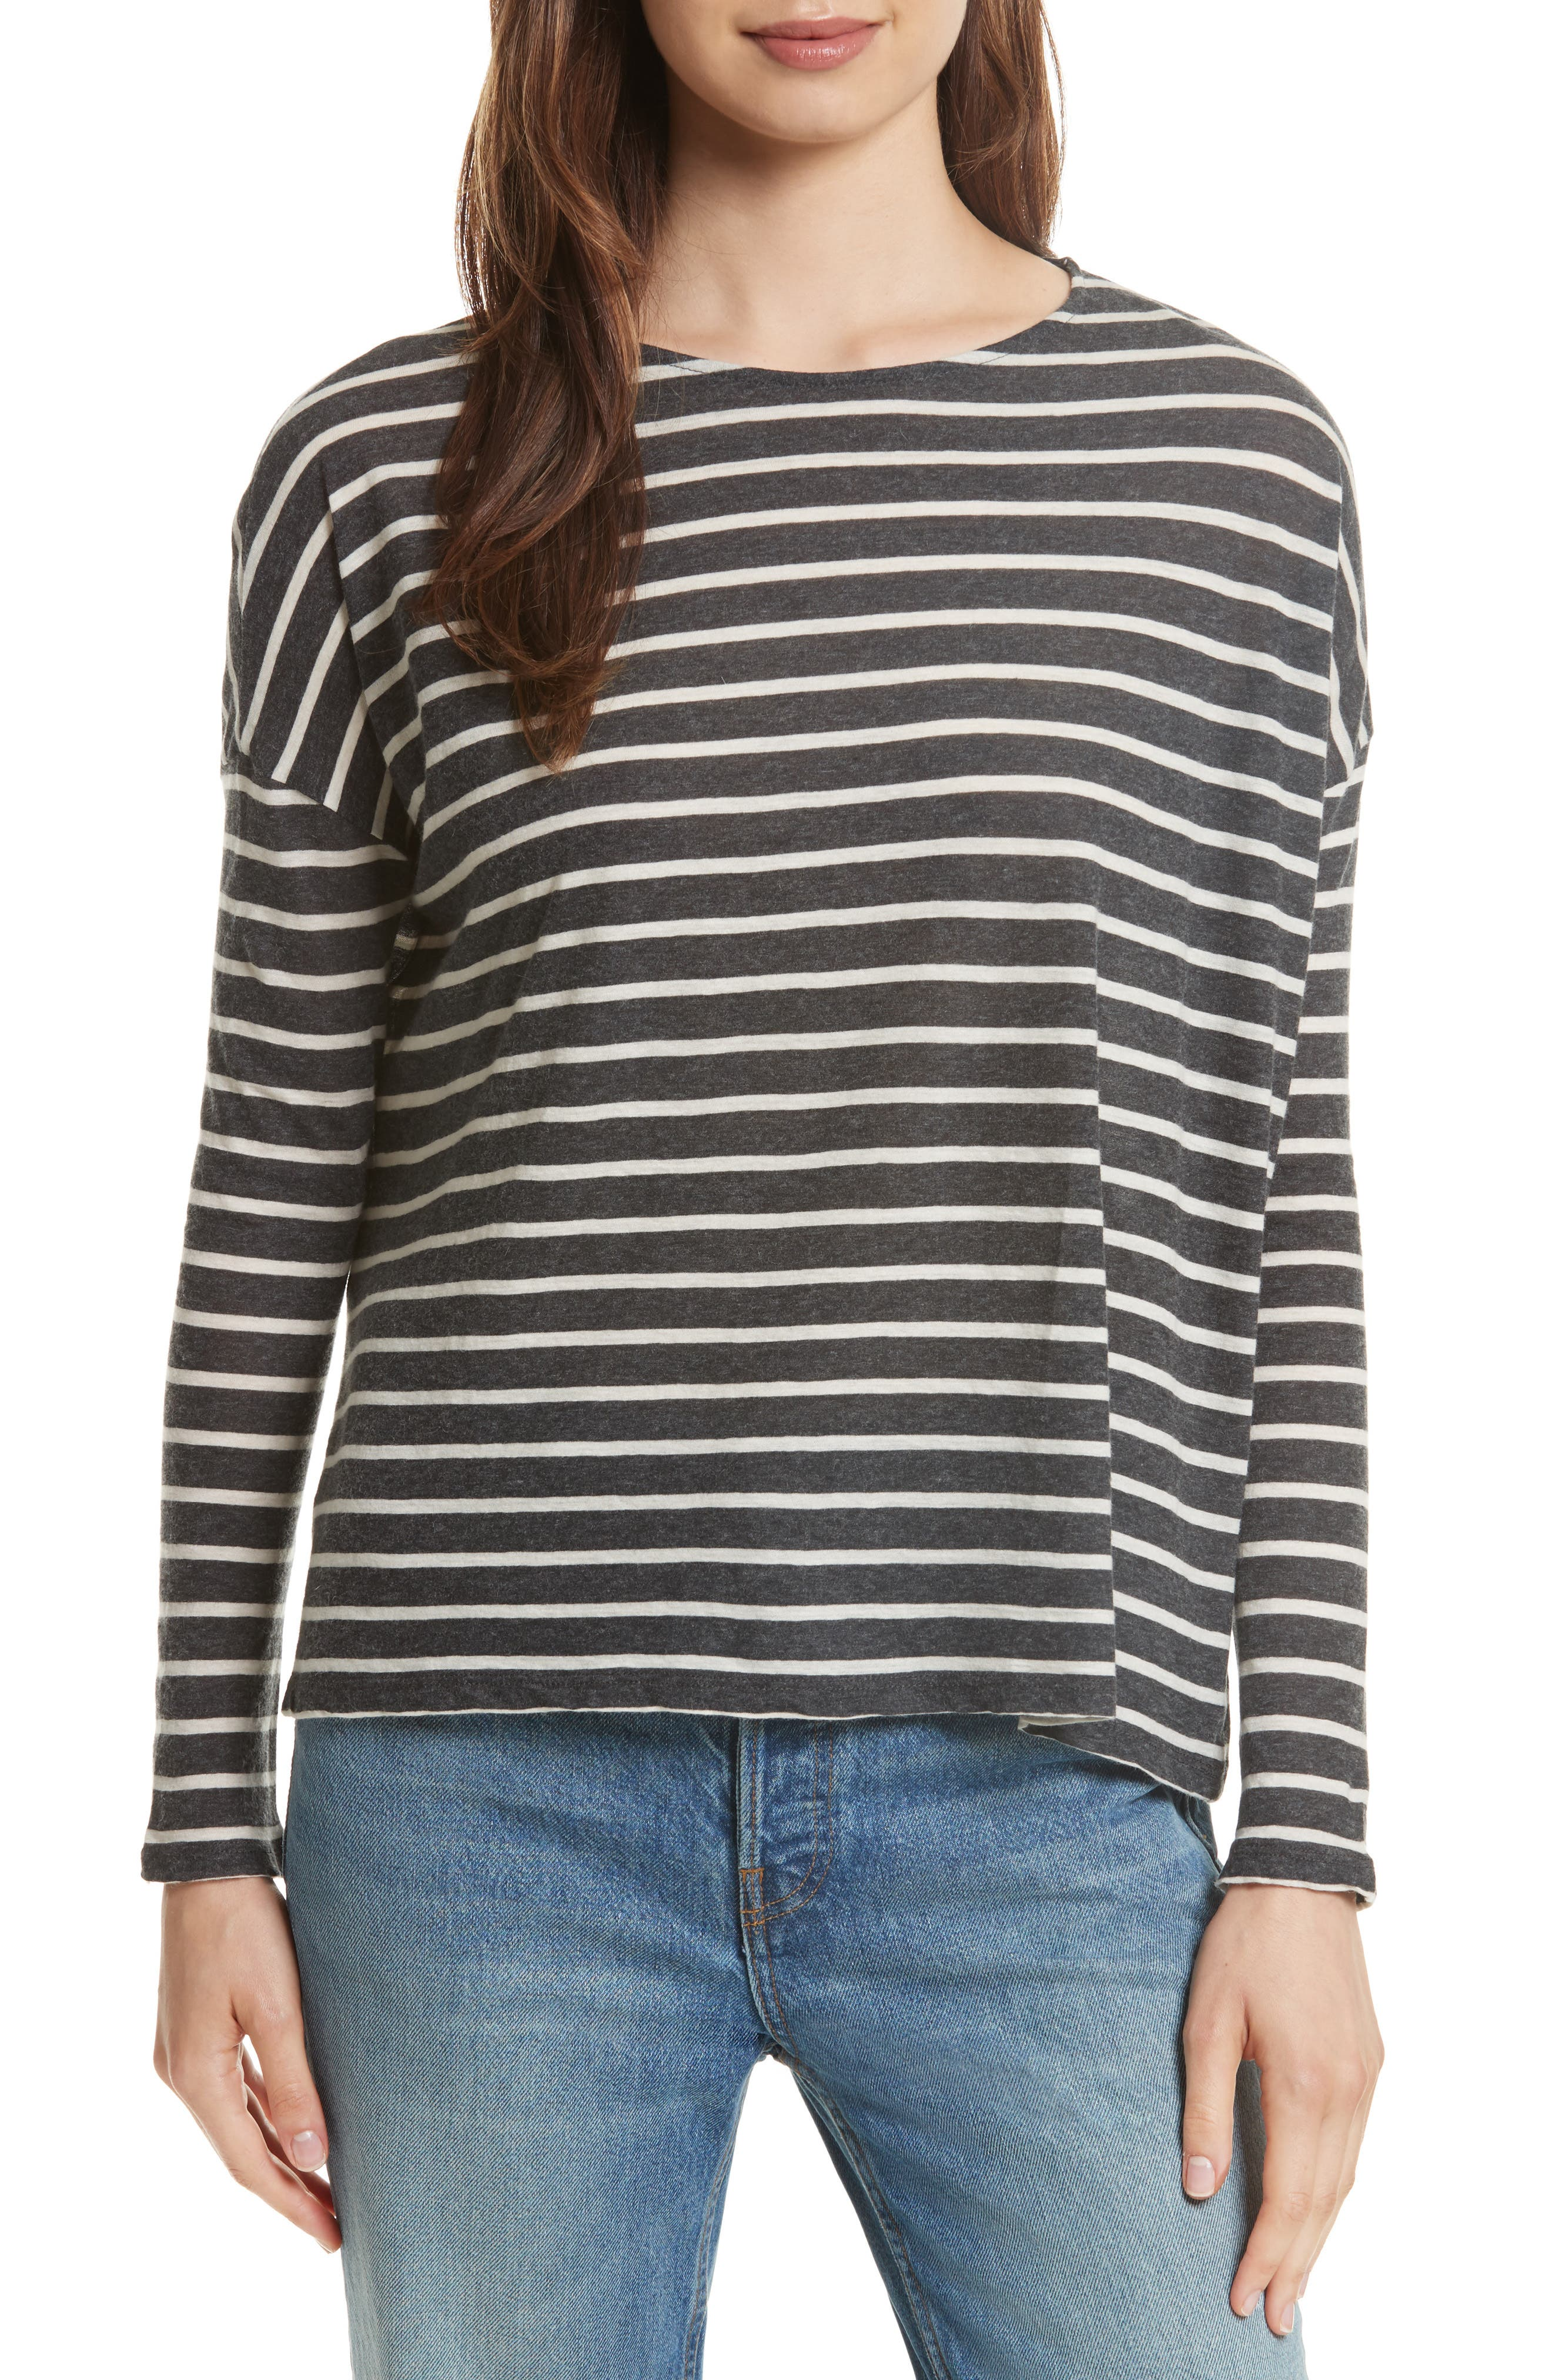 Main Image - Majestic Filatures Stripe Cotton & Cashmere Boatneck Top